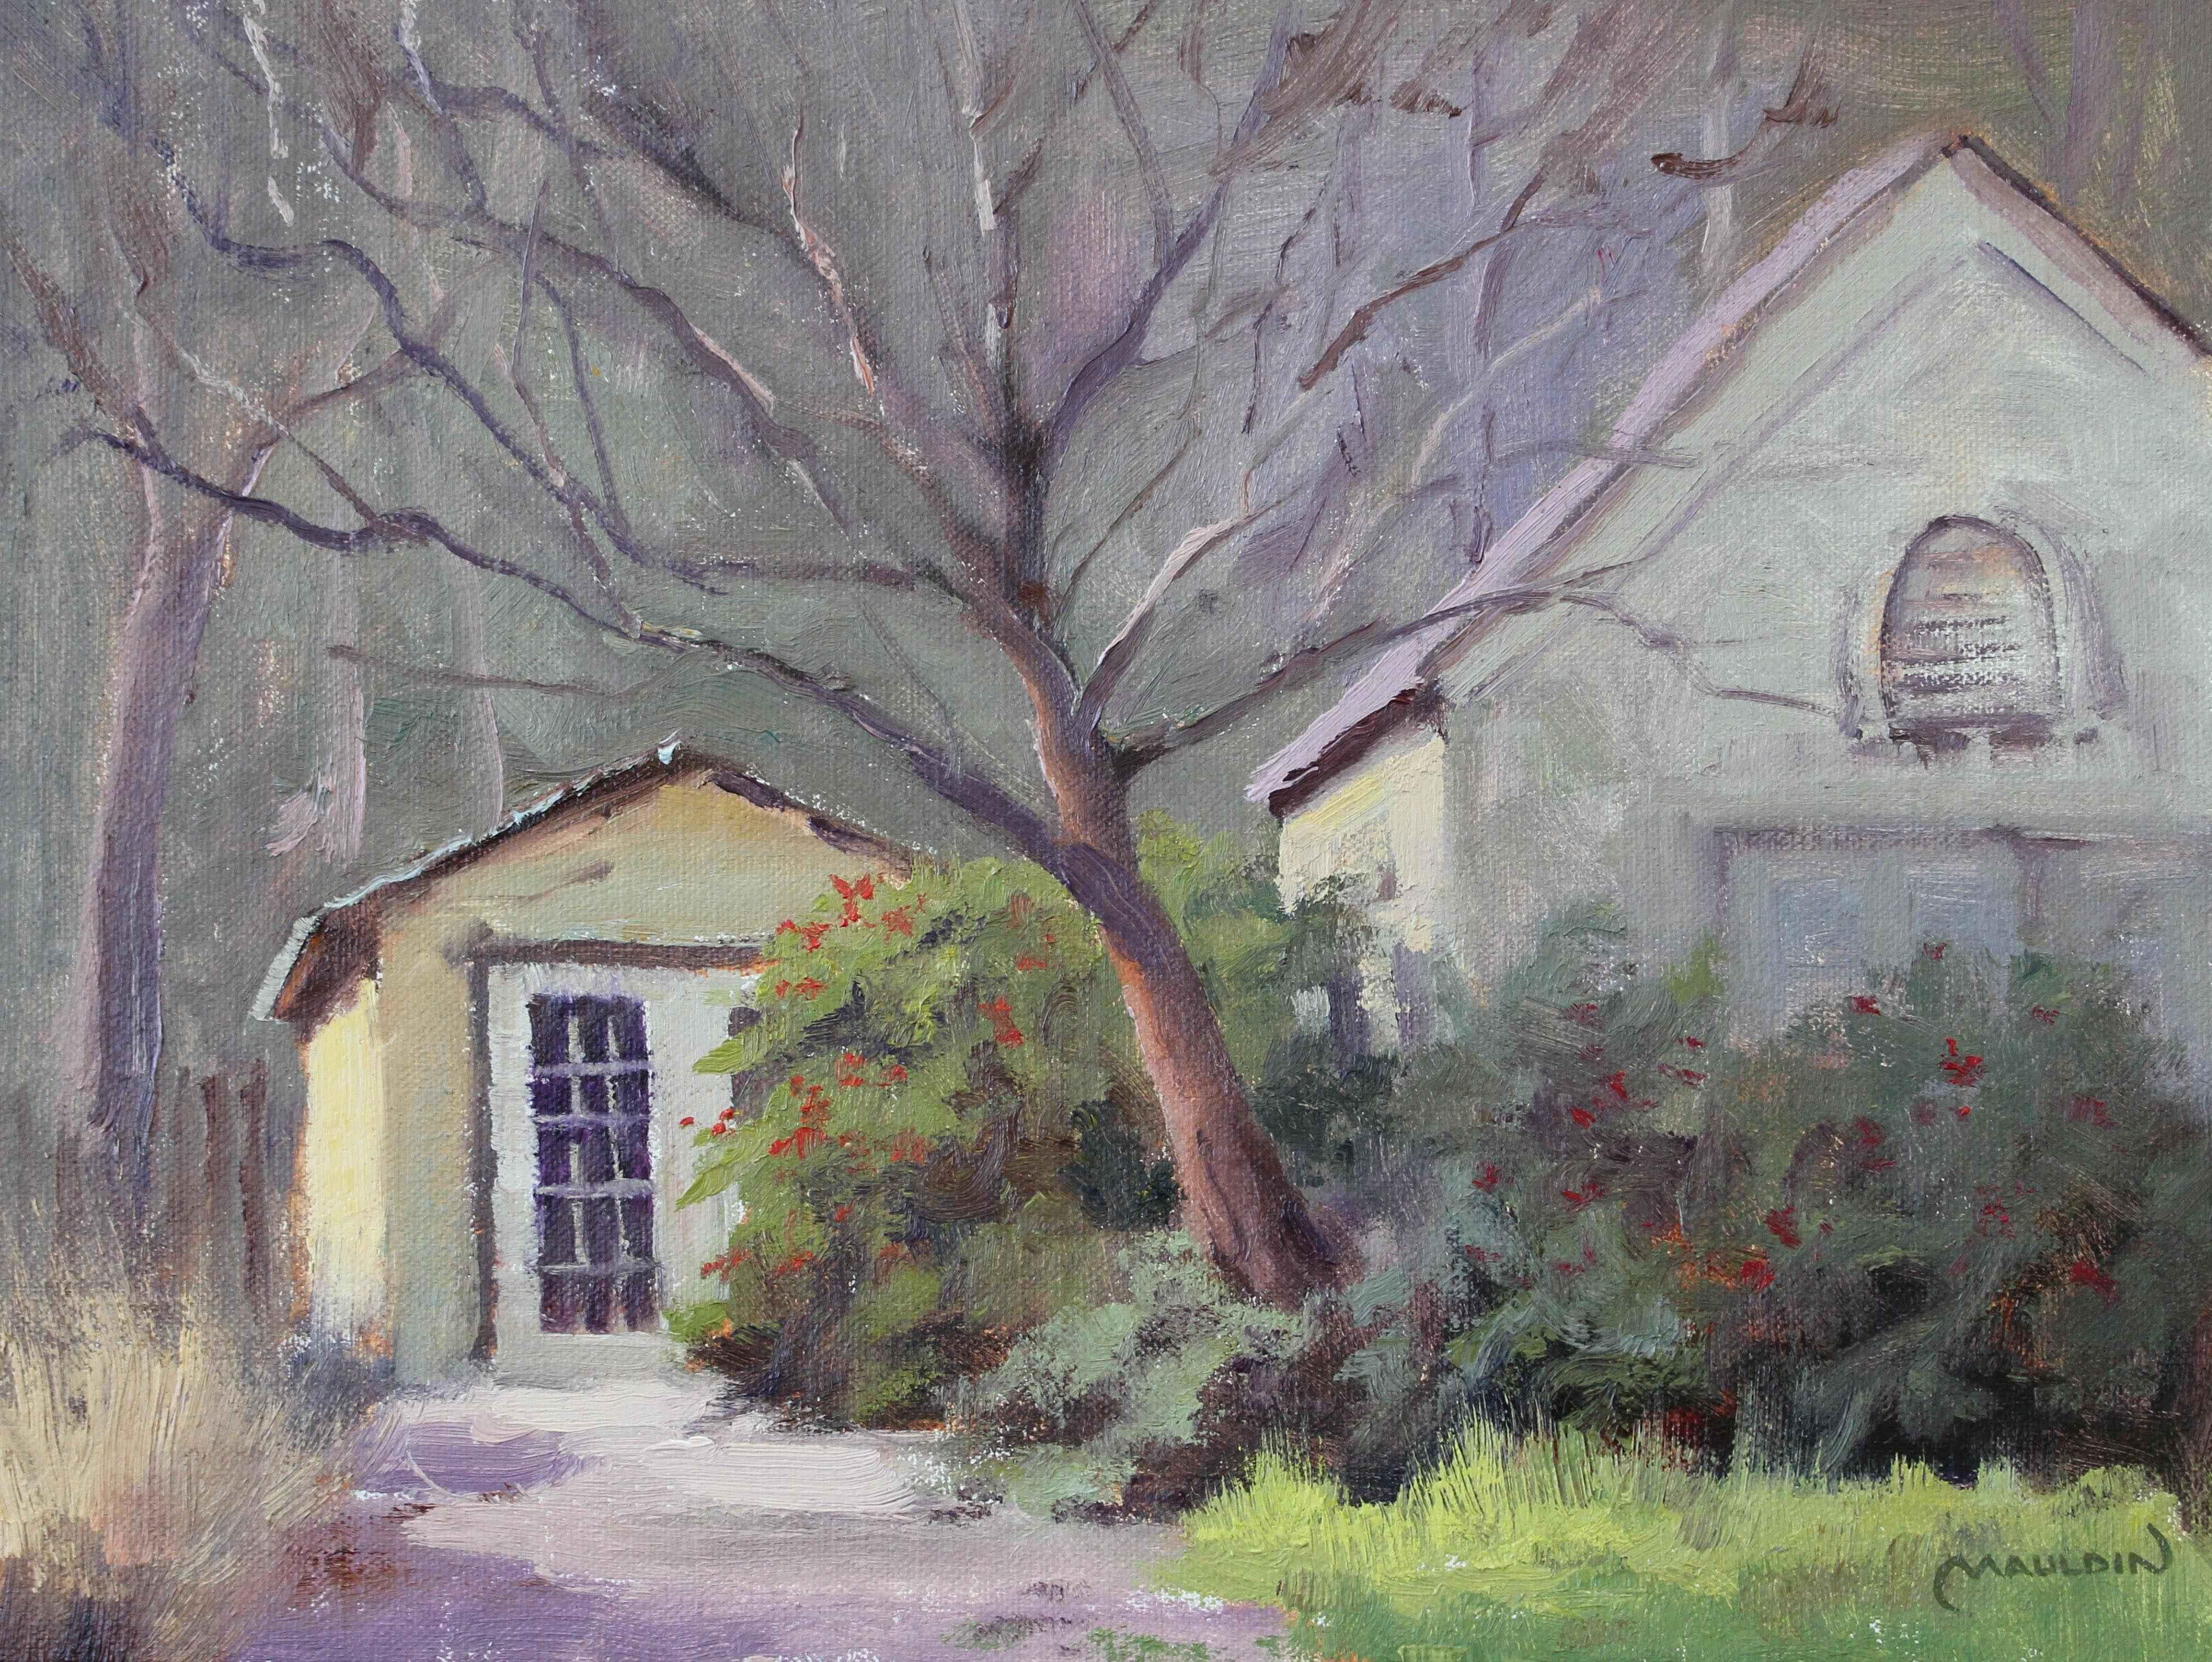 White Rock House by  Chuck Mauldin - Masterpiece Online